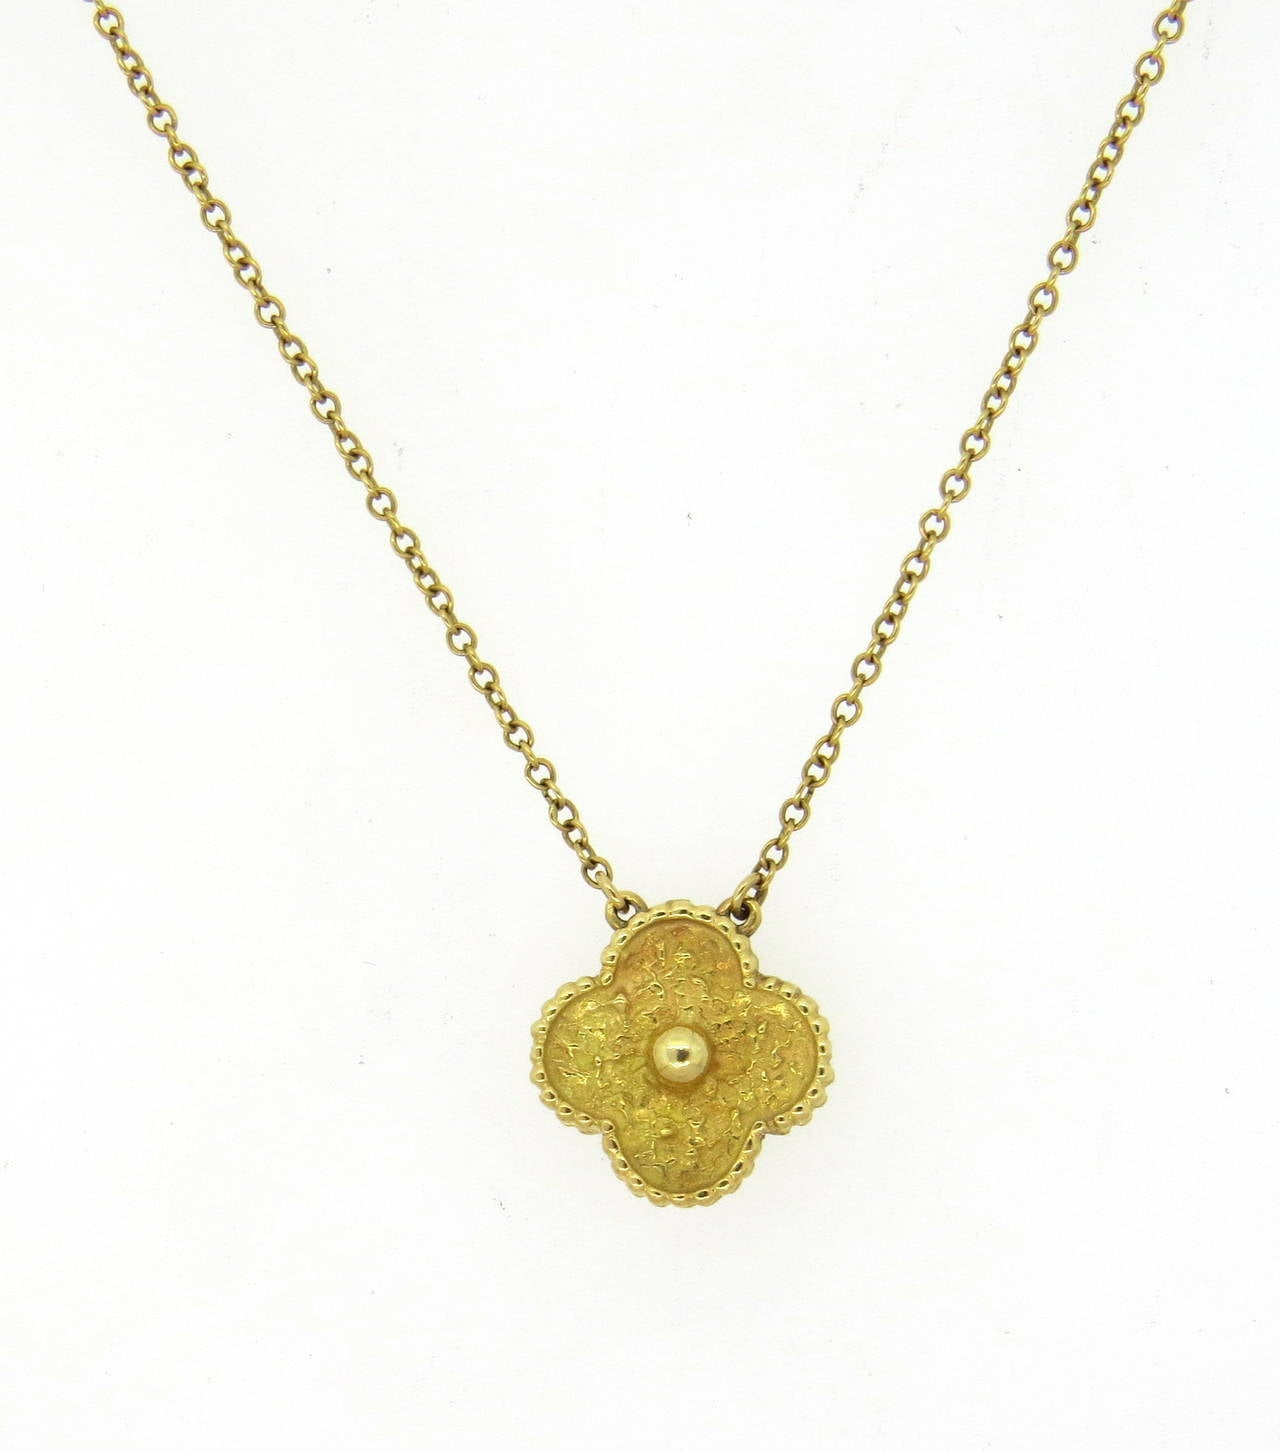 Clover Necklace Van Cleef: Van Cleef And Arpels Vintage Alhambra Gold Clover Pendant